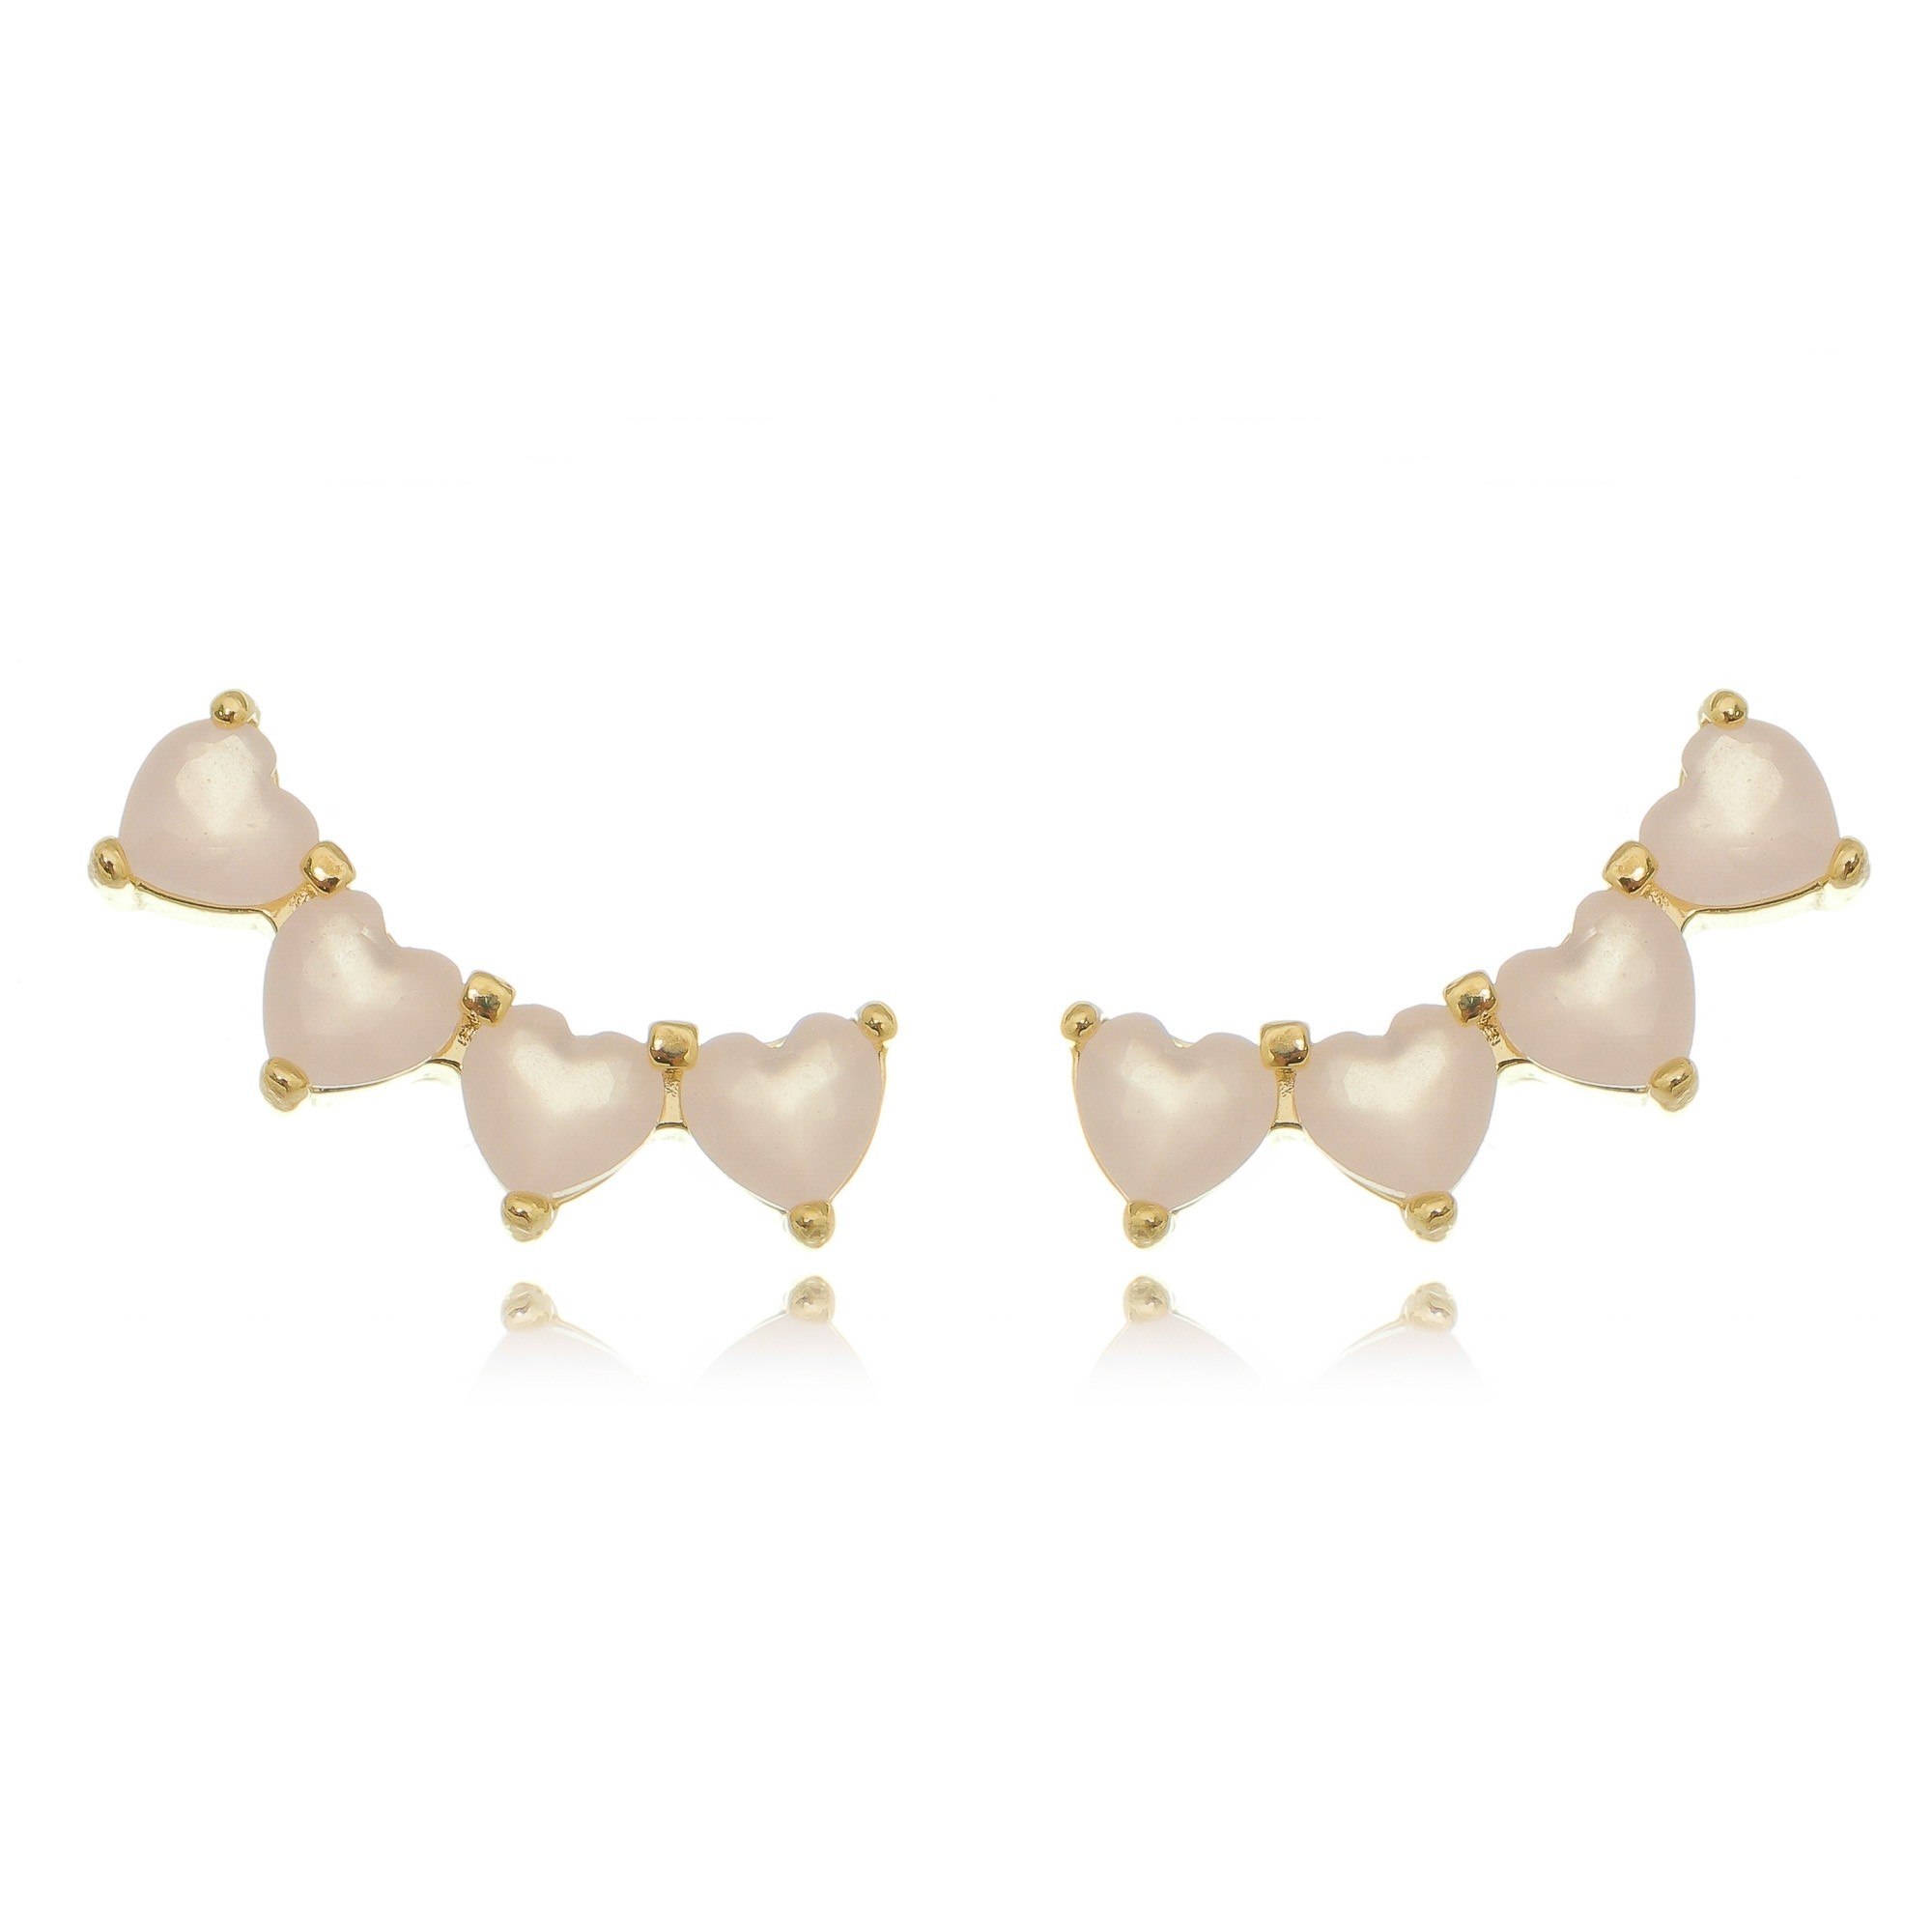 Ear Cuff Mini Corações Quartzo Rosa Semijoia Delicada em Ouro 18K  - Soloyou